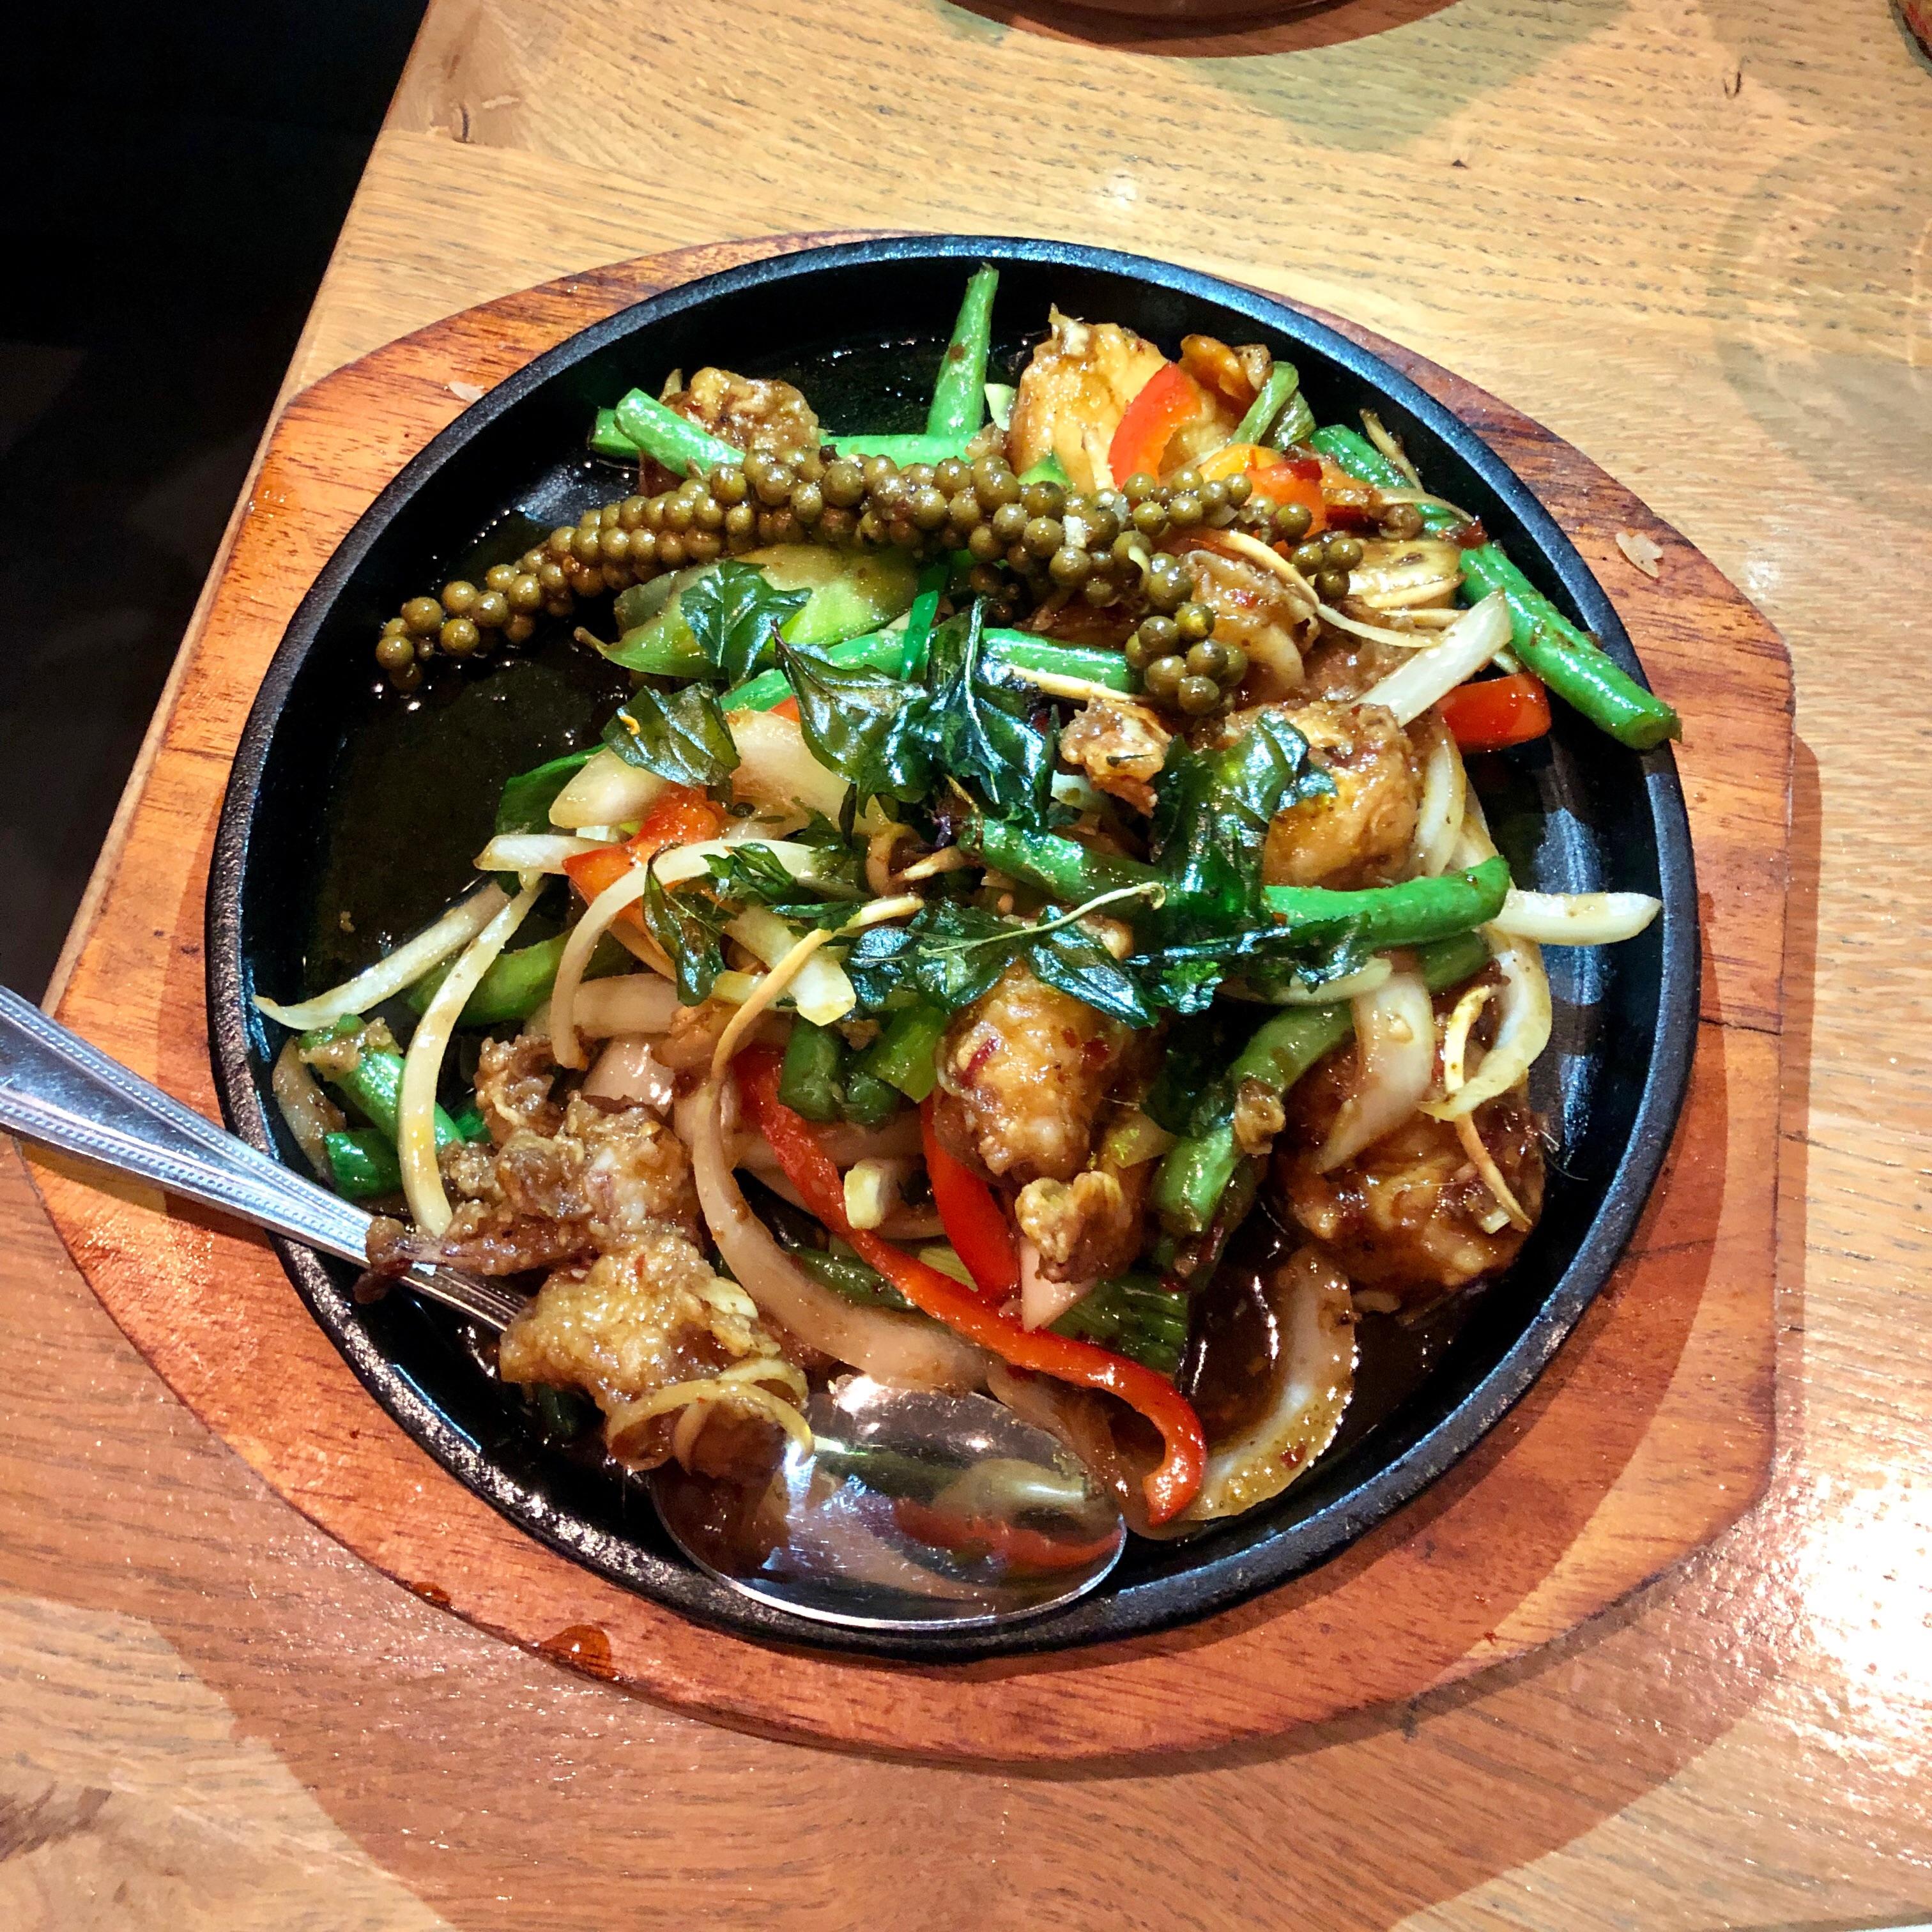 Sizzling Seafood Farmhouse Kitchen Thai Cuisine Eats For Me